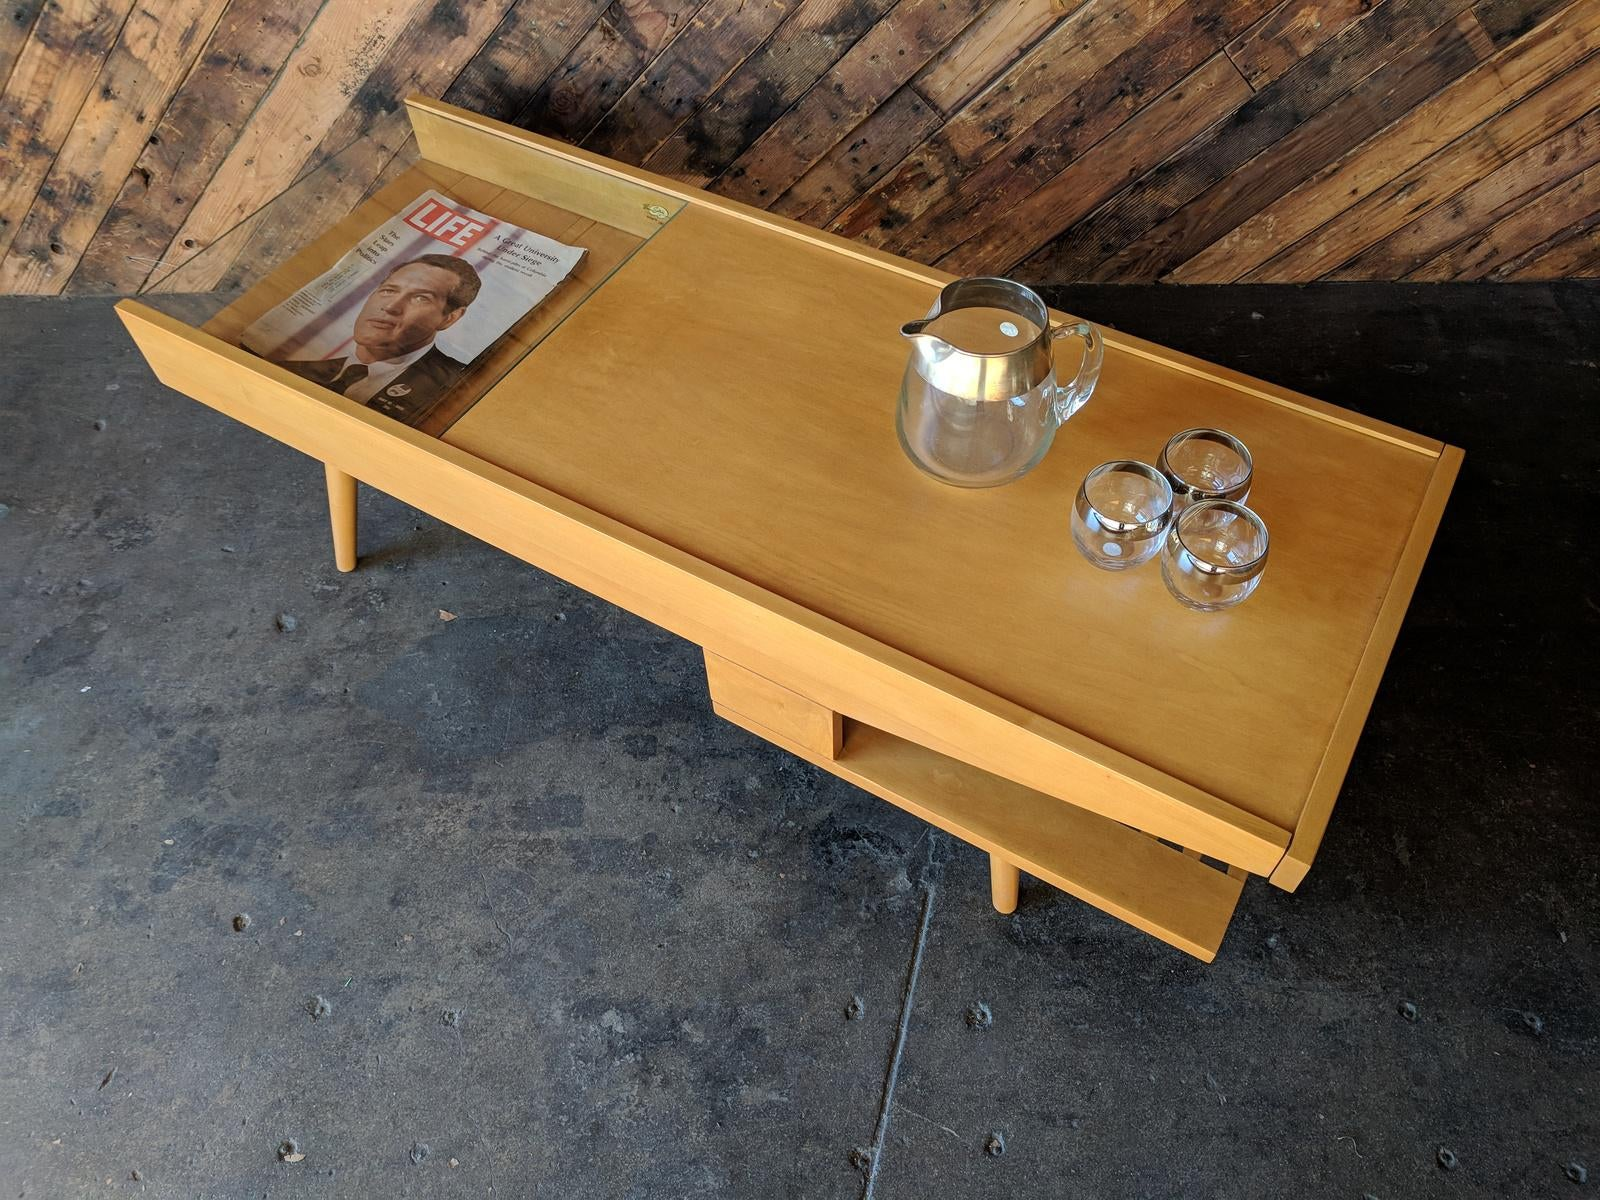 Attirant Amazing Mid Century Coffee Warmer Table By Brown Saltman   Image 5 Of 9